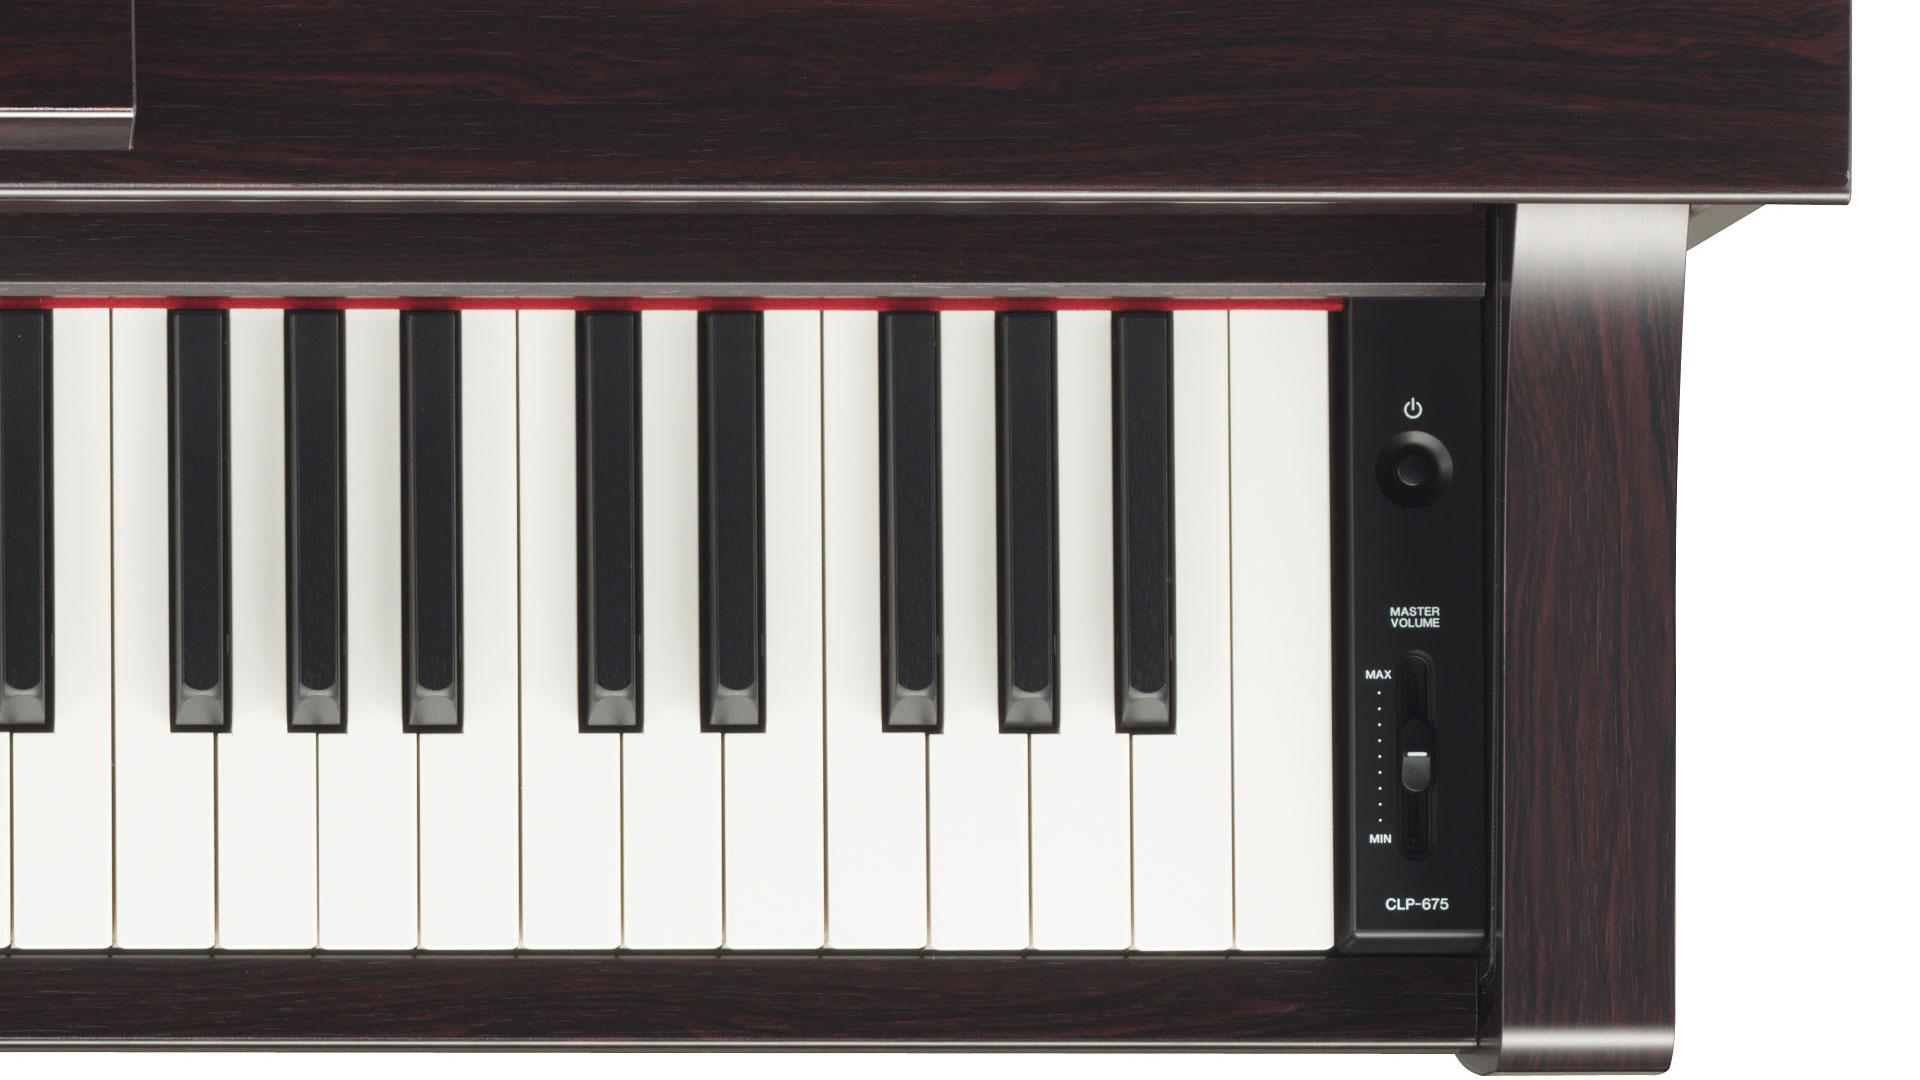 clp 675 yamaha clavinova digital piano buy online yamaha digital pianos electronic piano. Black Bedroom Furniture Sets. Home Design Ideas